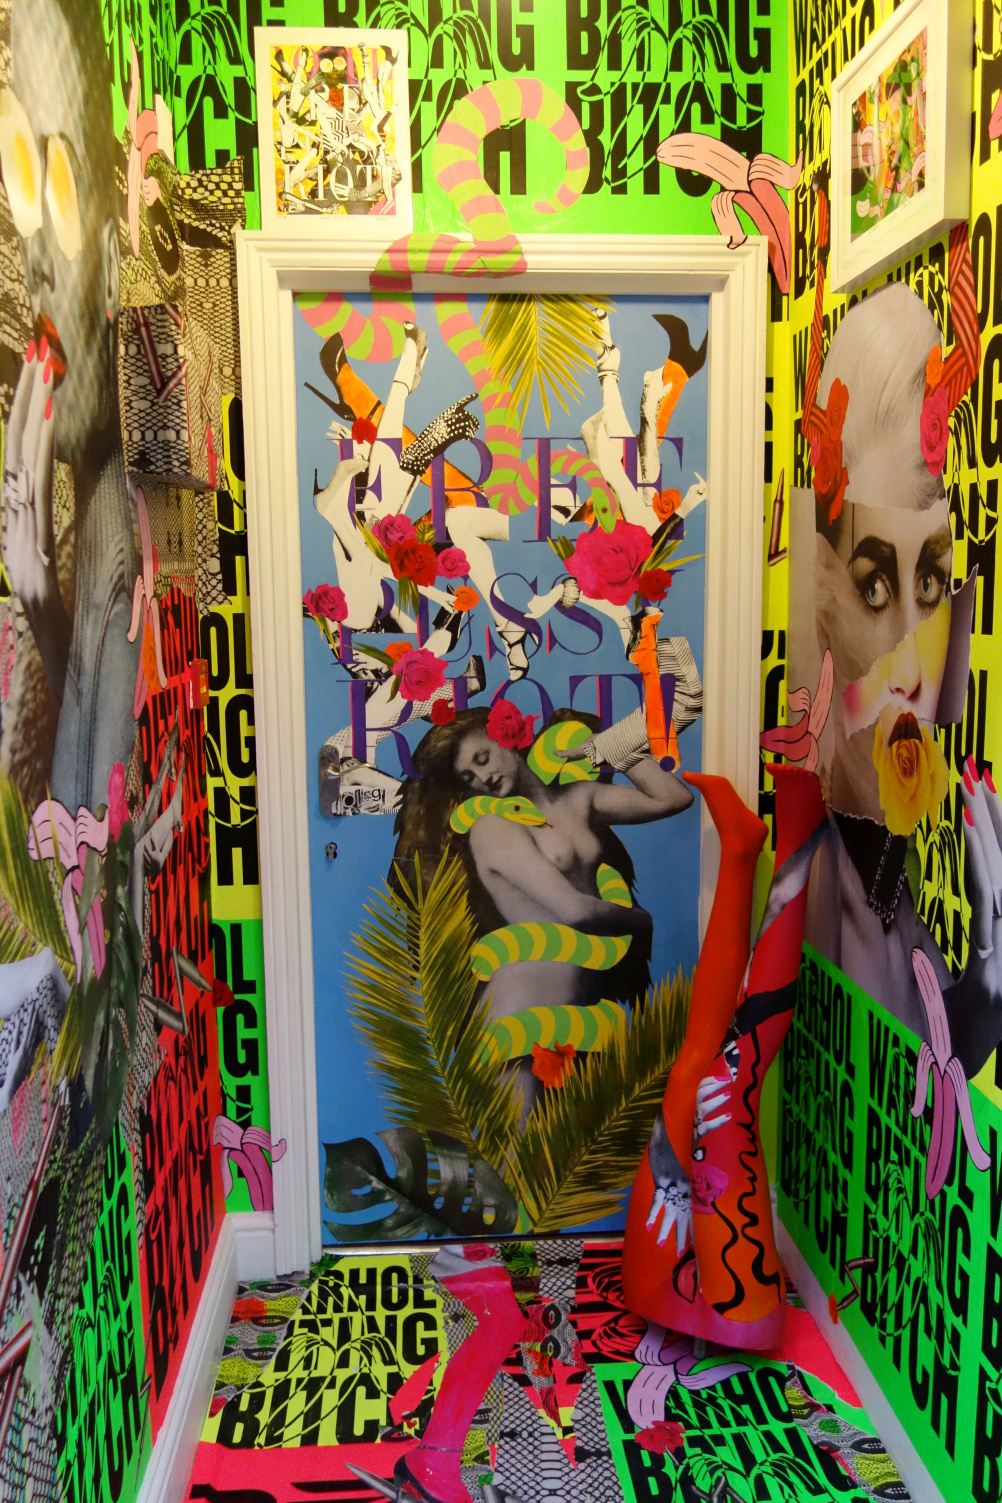 A Hysteria installation